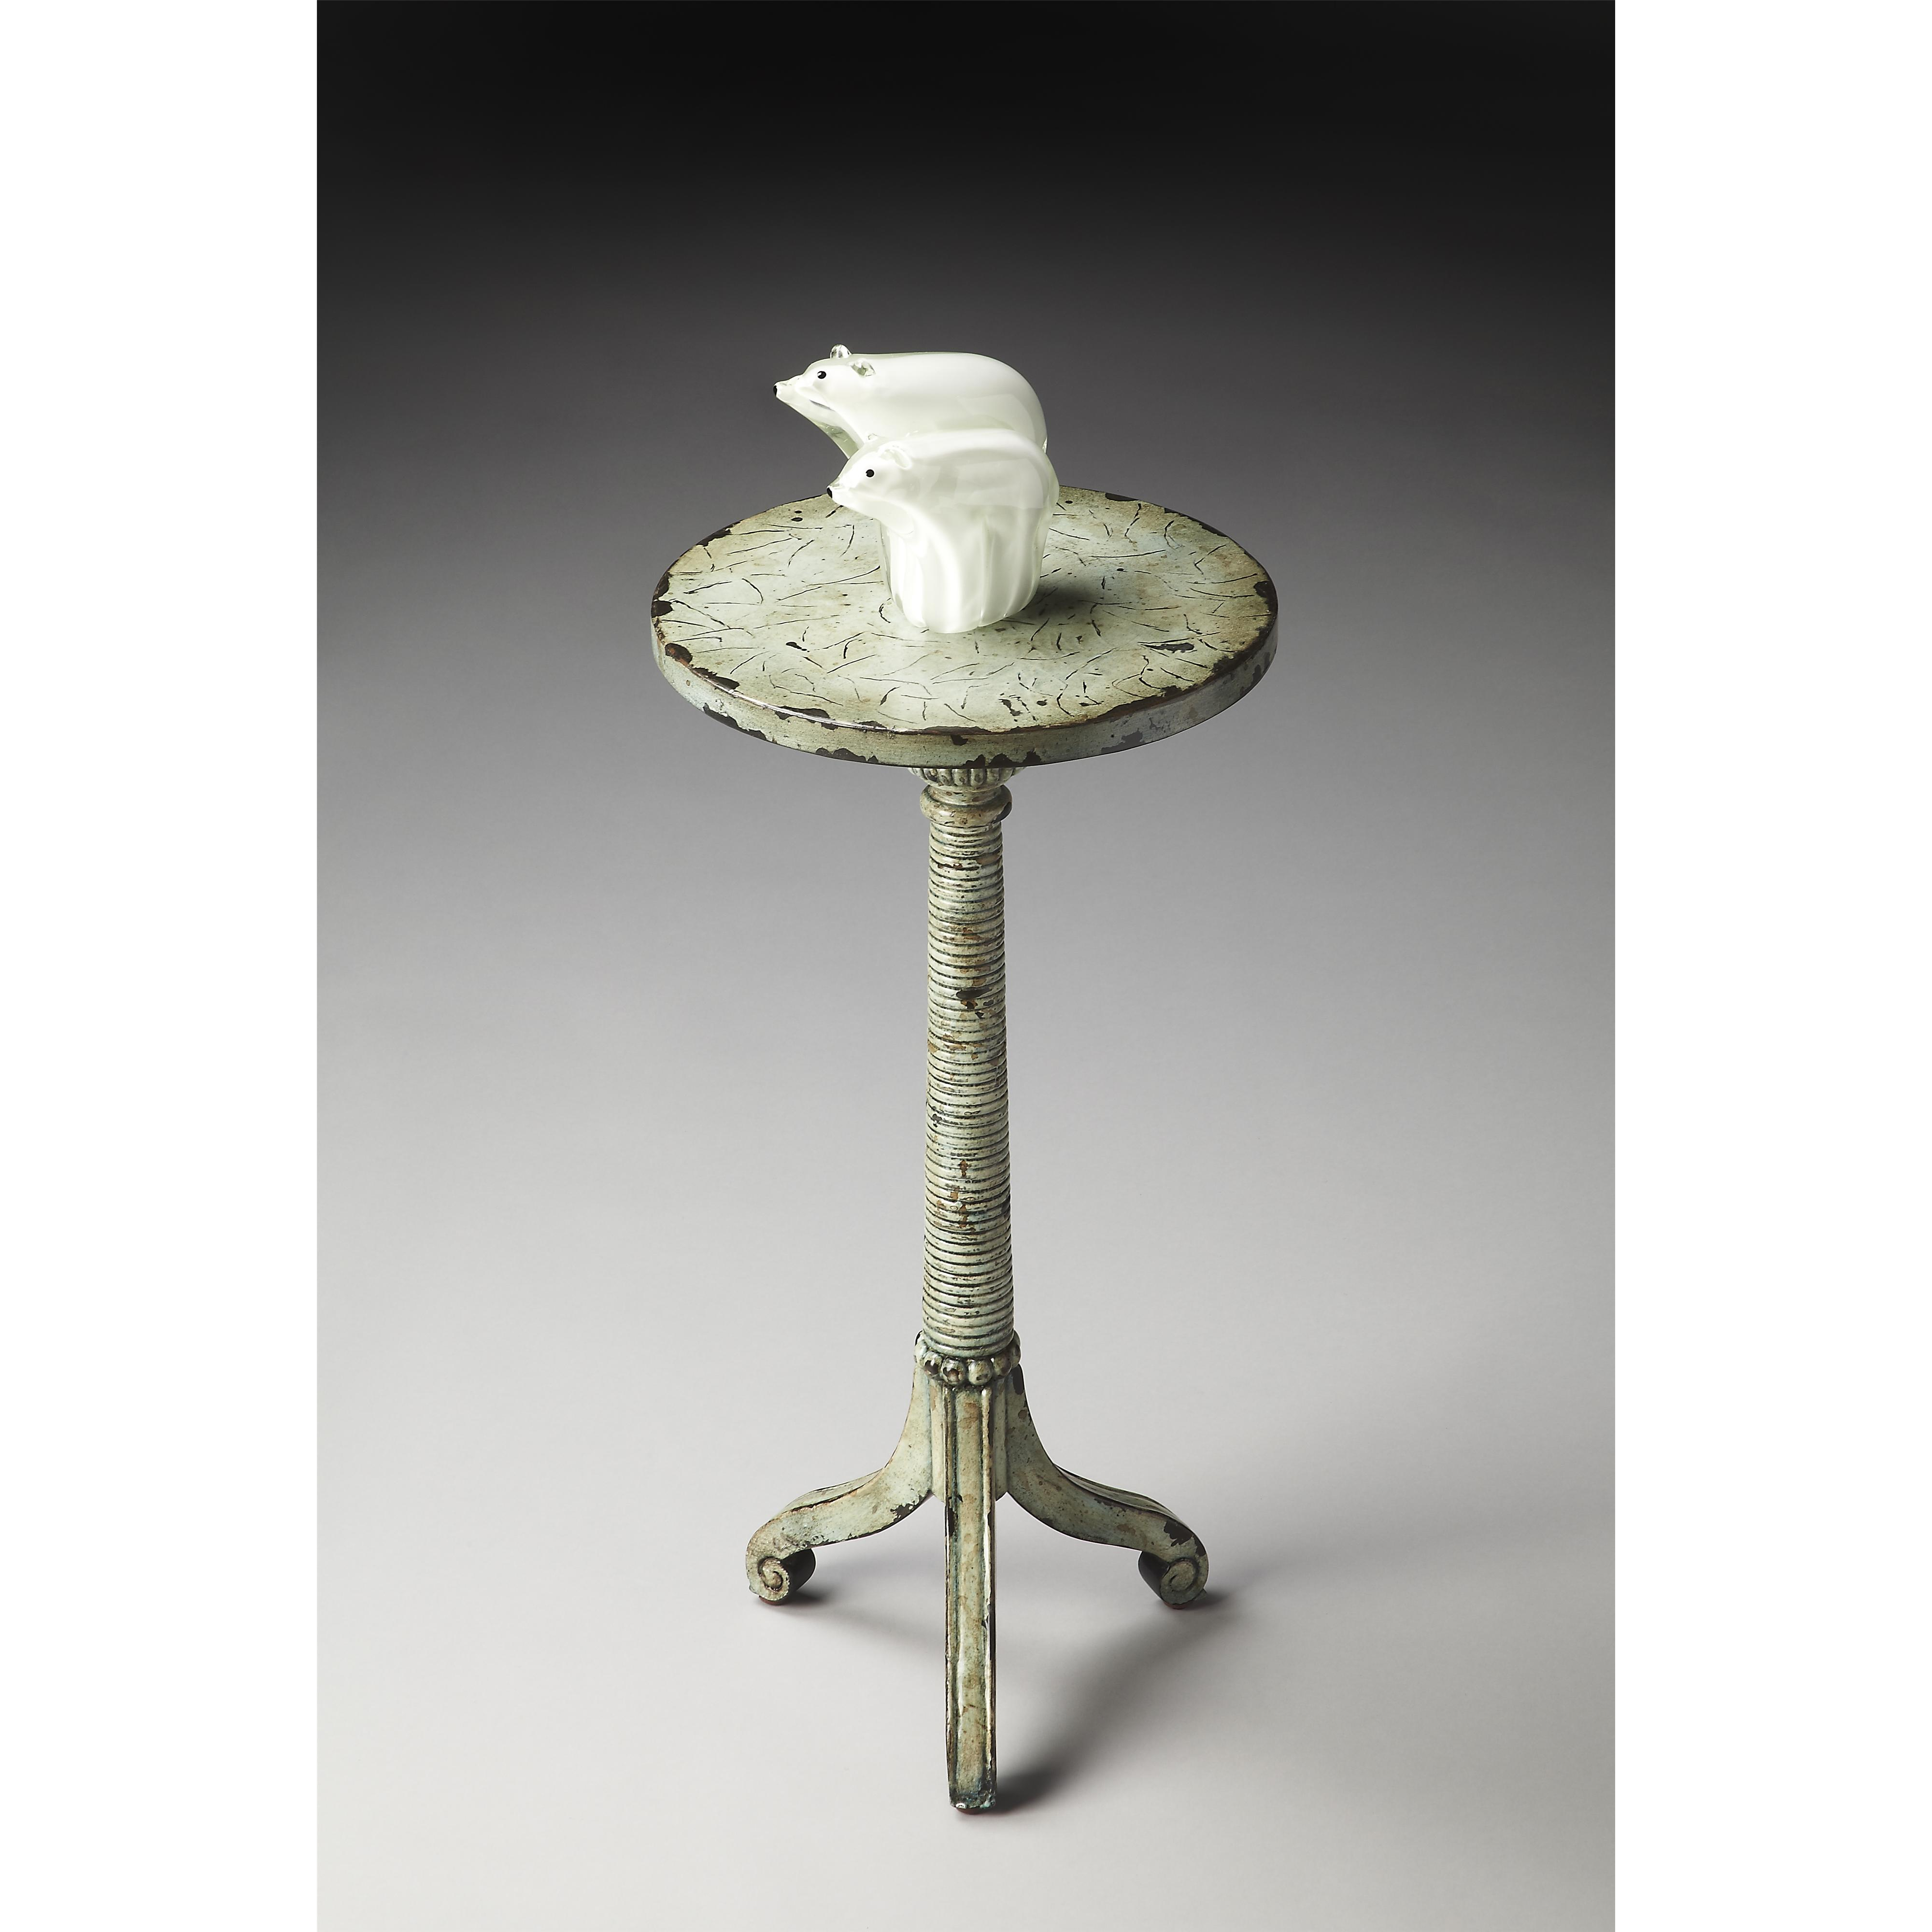 Butler Specialty Company Artist's Originals Pedestal Table - Item Number: 1583265